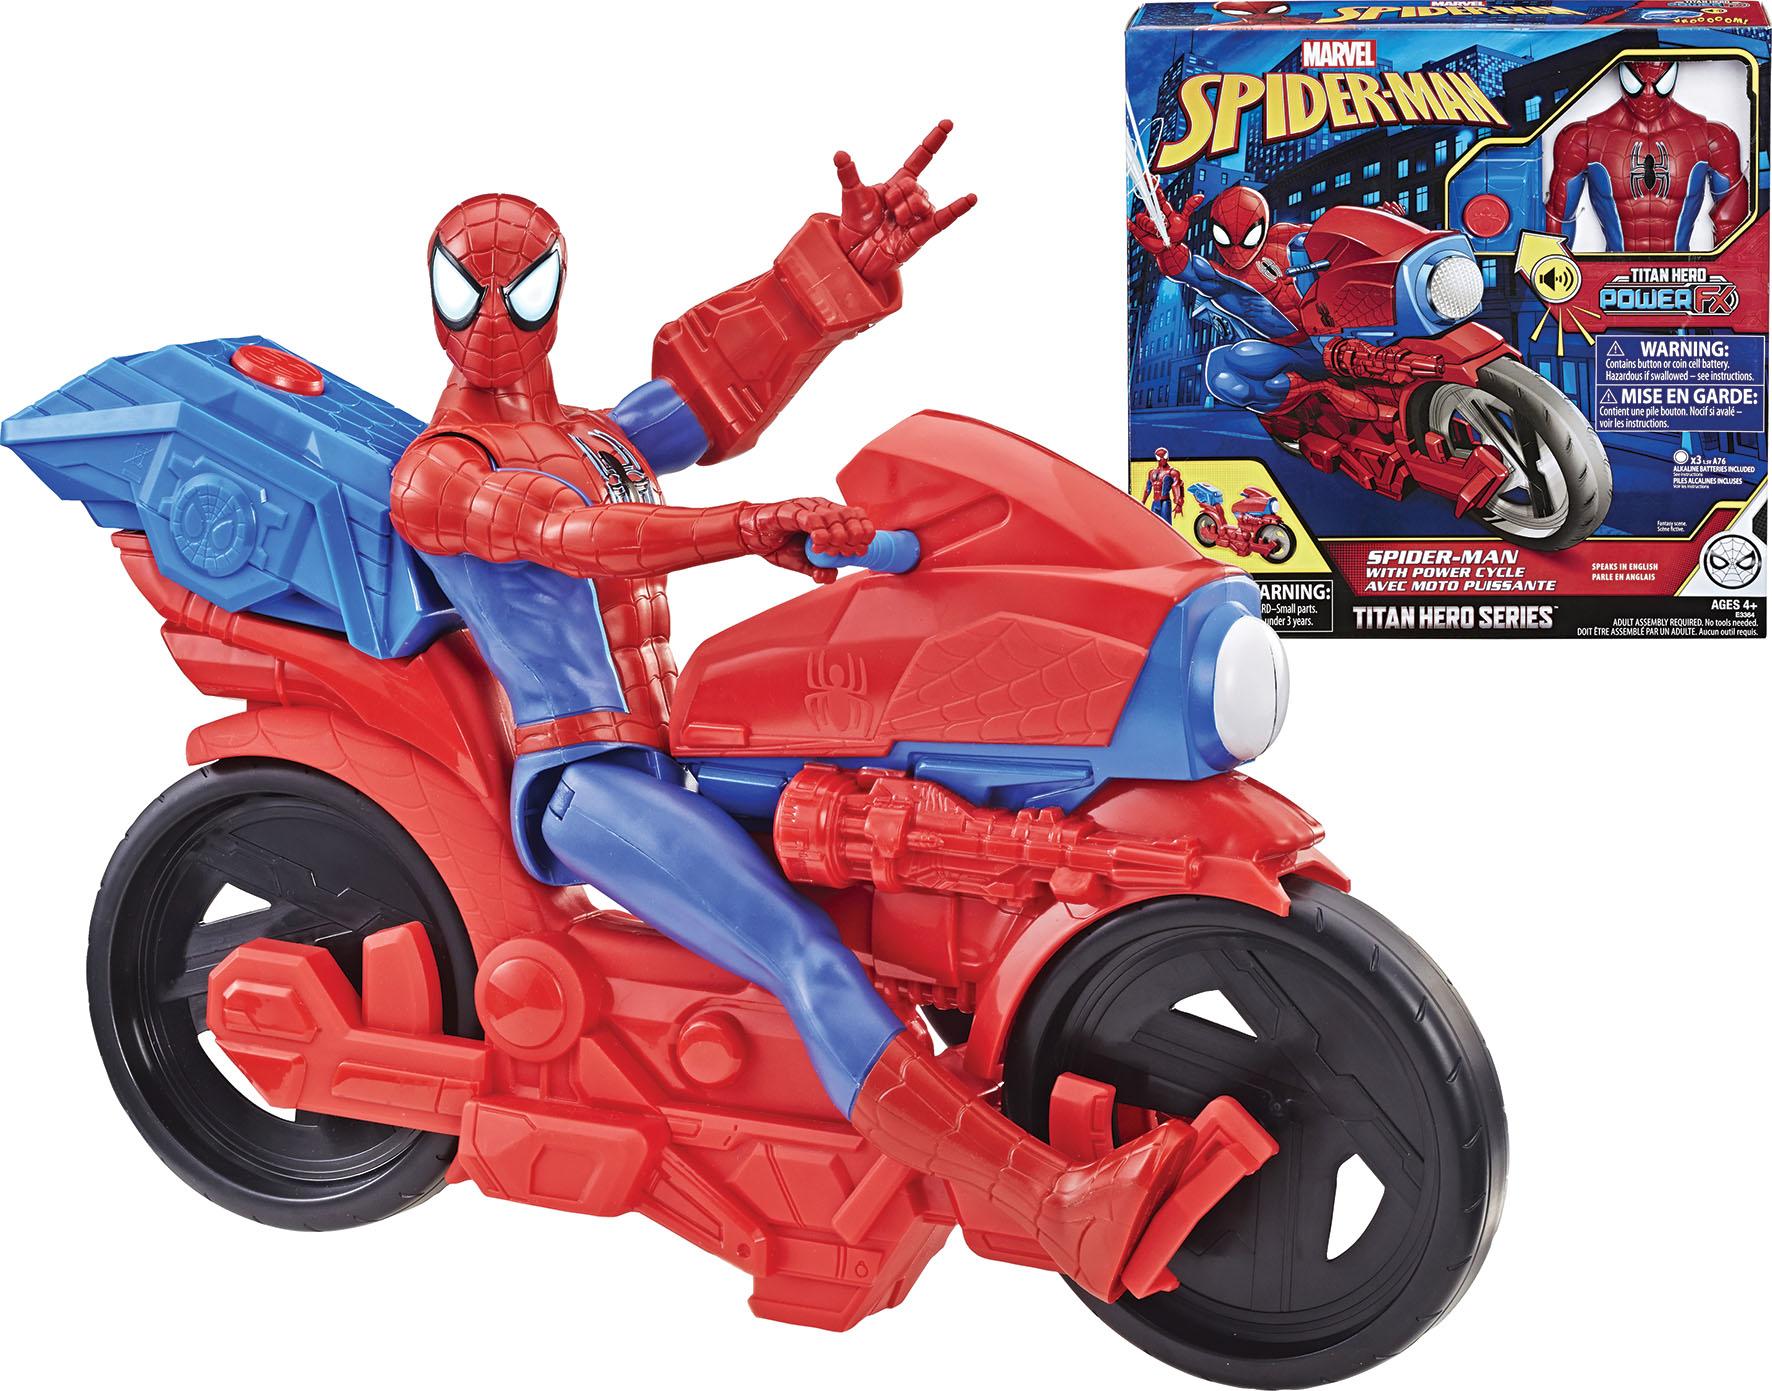 SPIDERMAN CM 30 ELETTR C MOTO